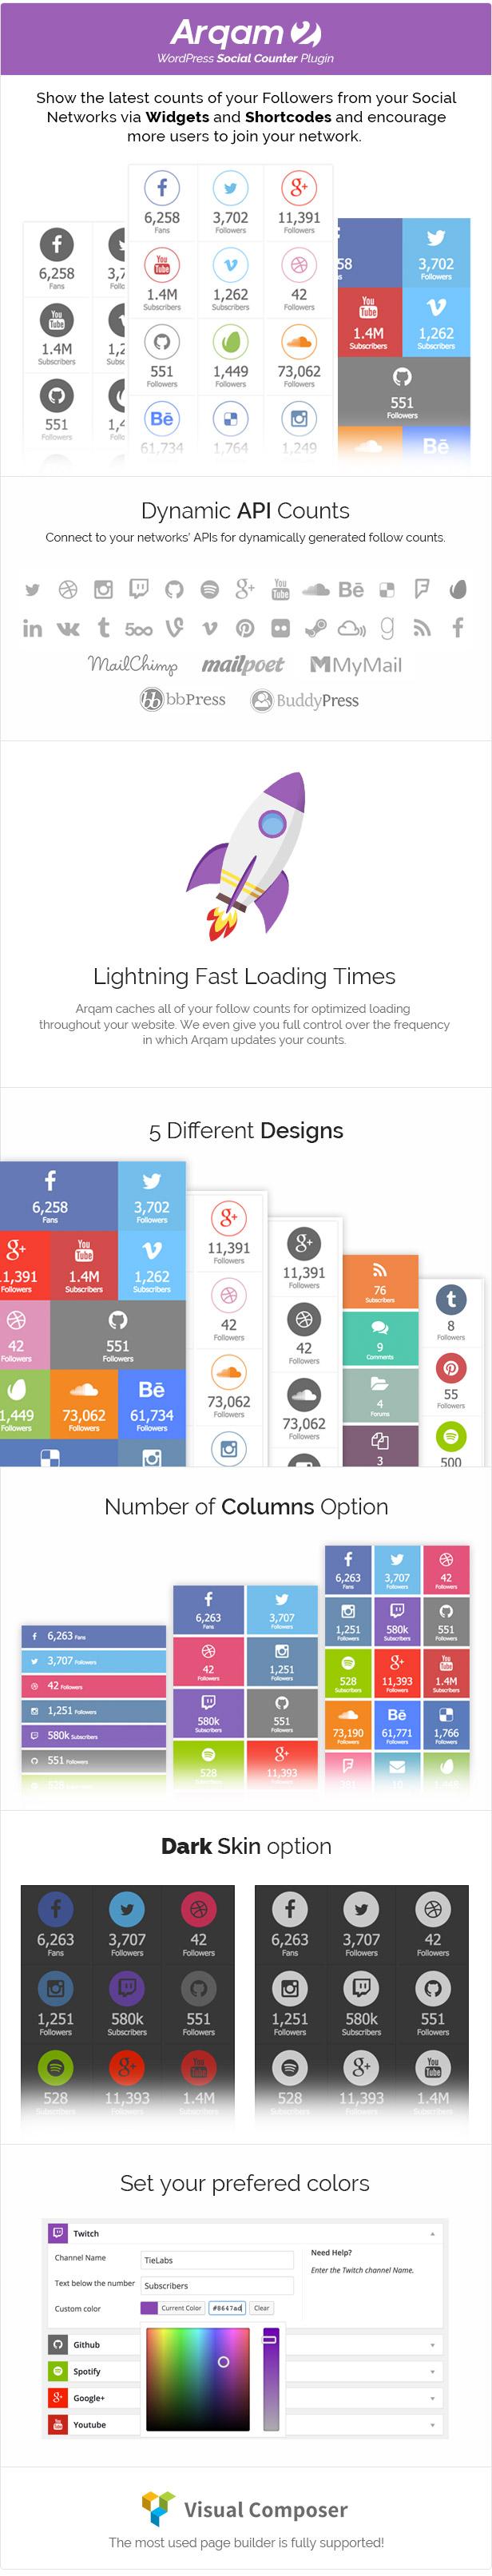 Social Counter Plugin for WordPress - Arqam - 2